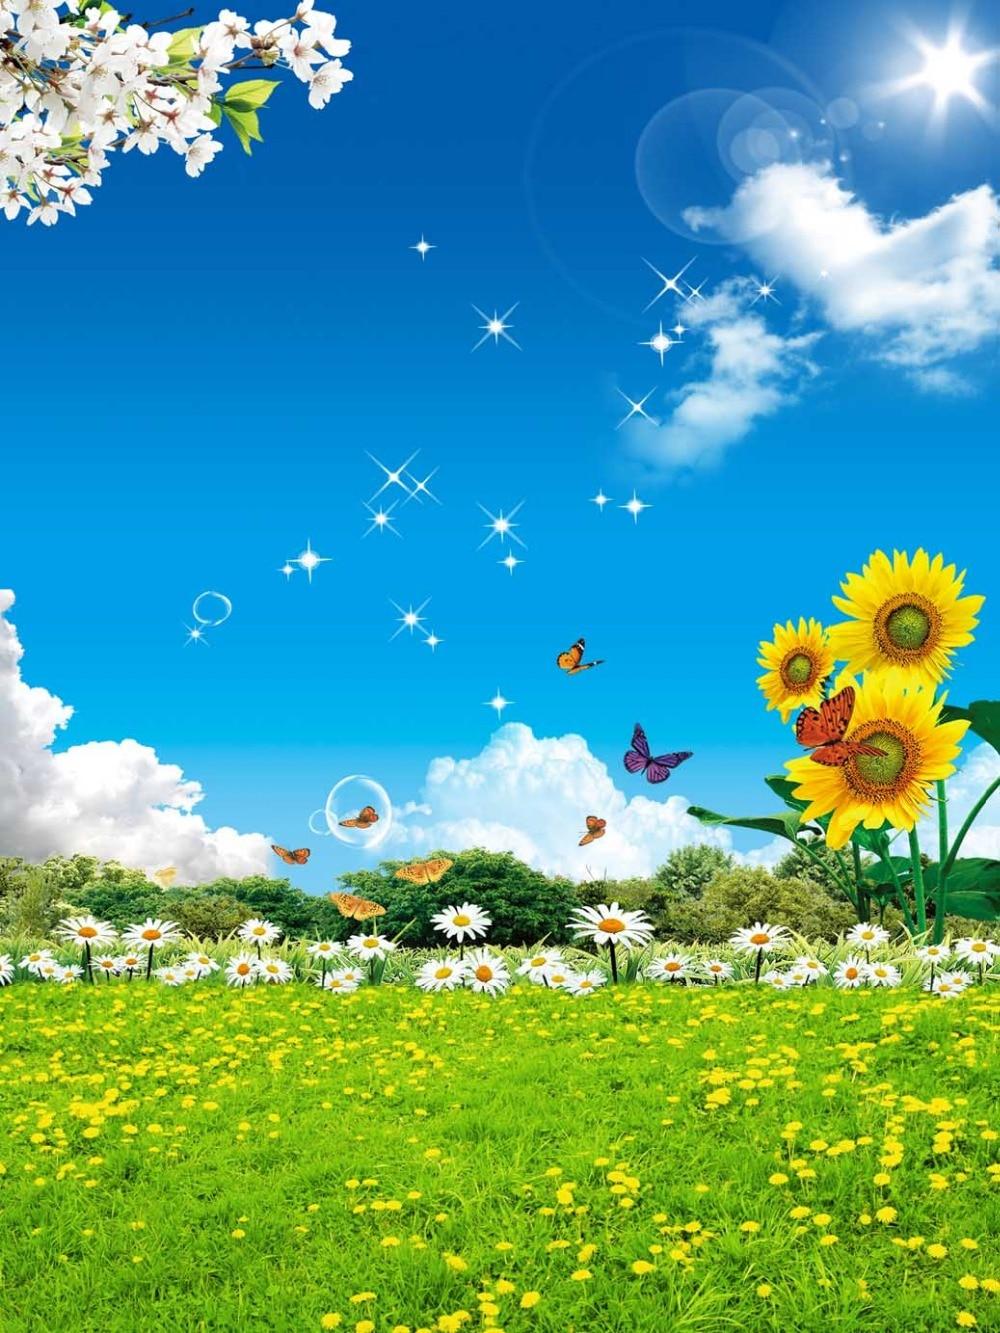 8x8ft clouds blue sky butterfly sunflowers field grass for Immagini sfondo desktop primavera